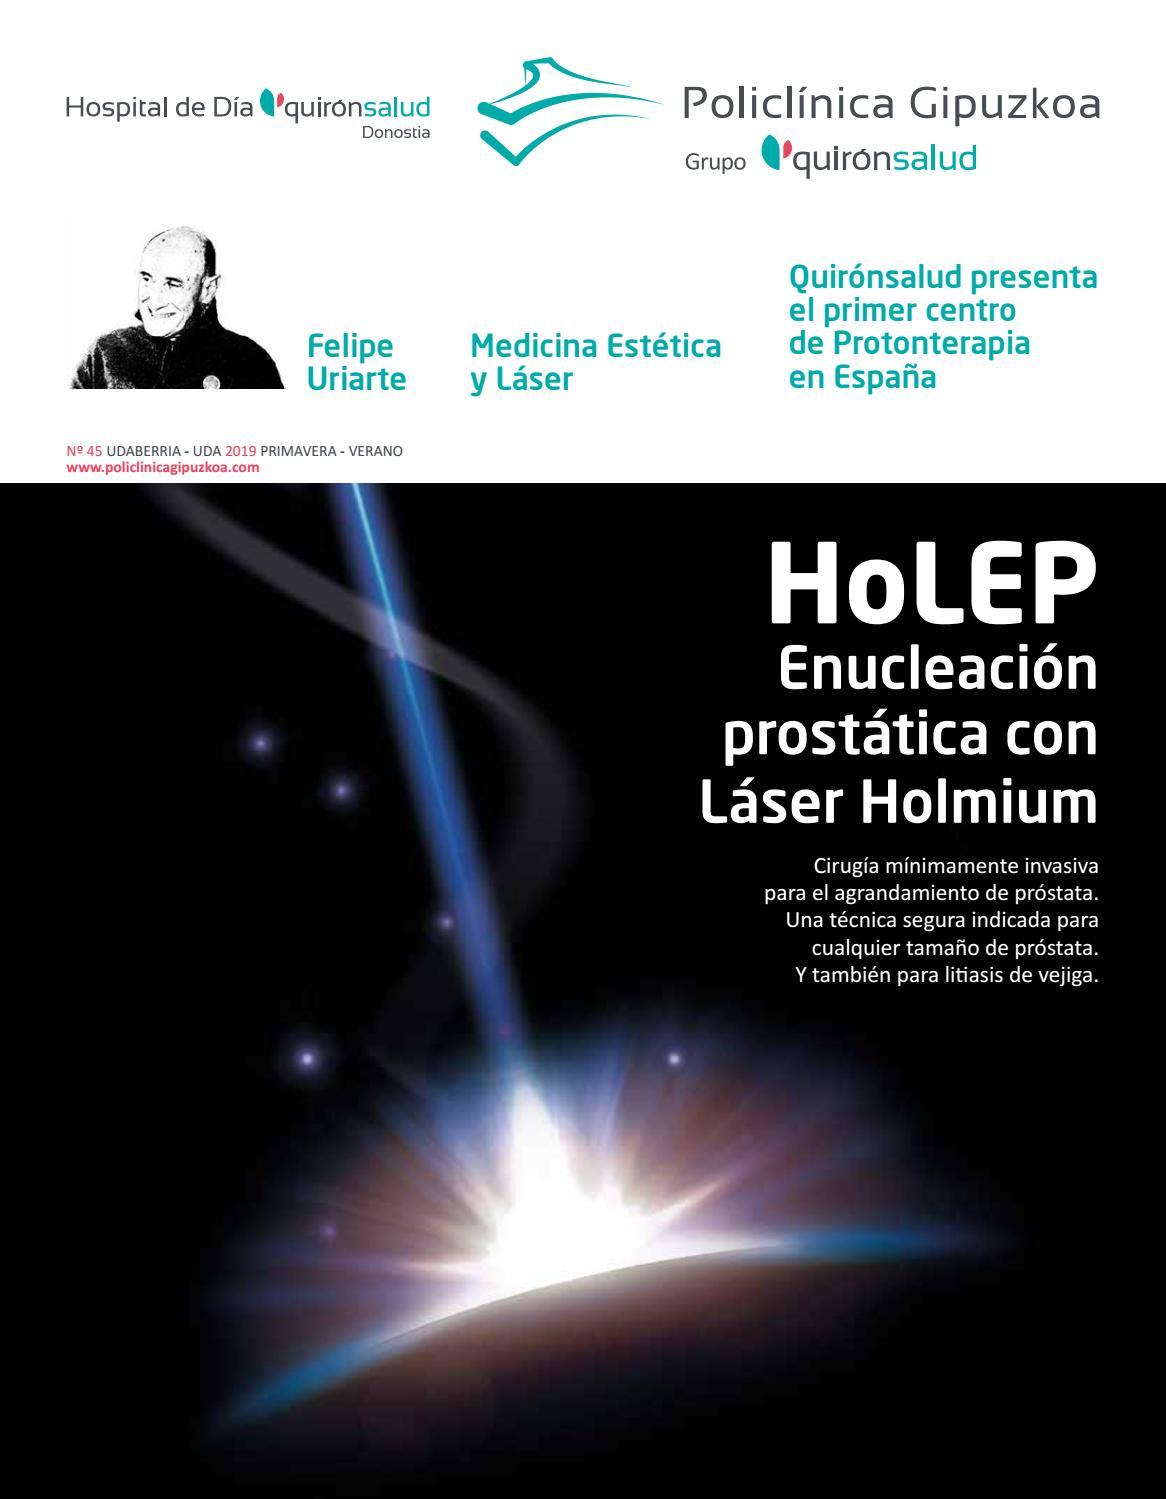 hospital bari urología próstata depilación láser